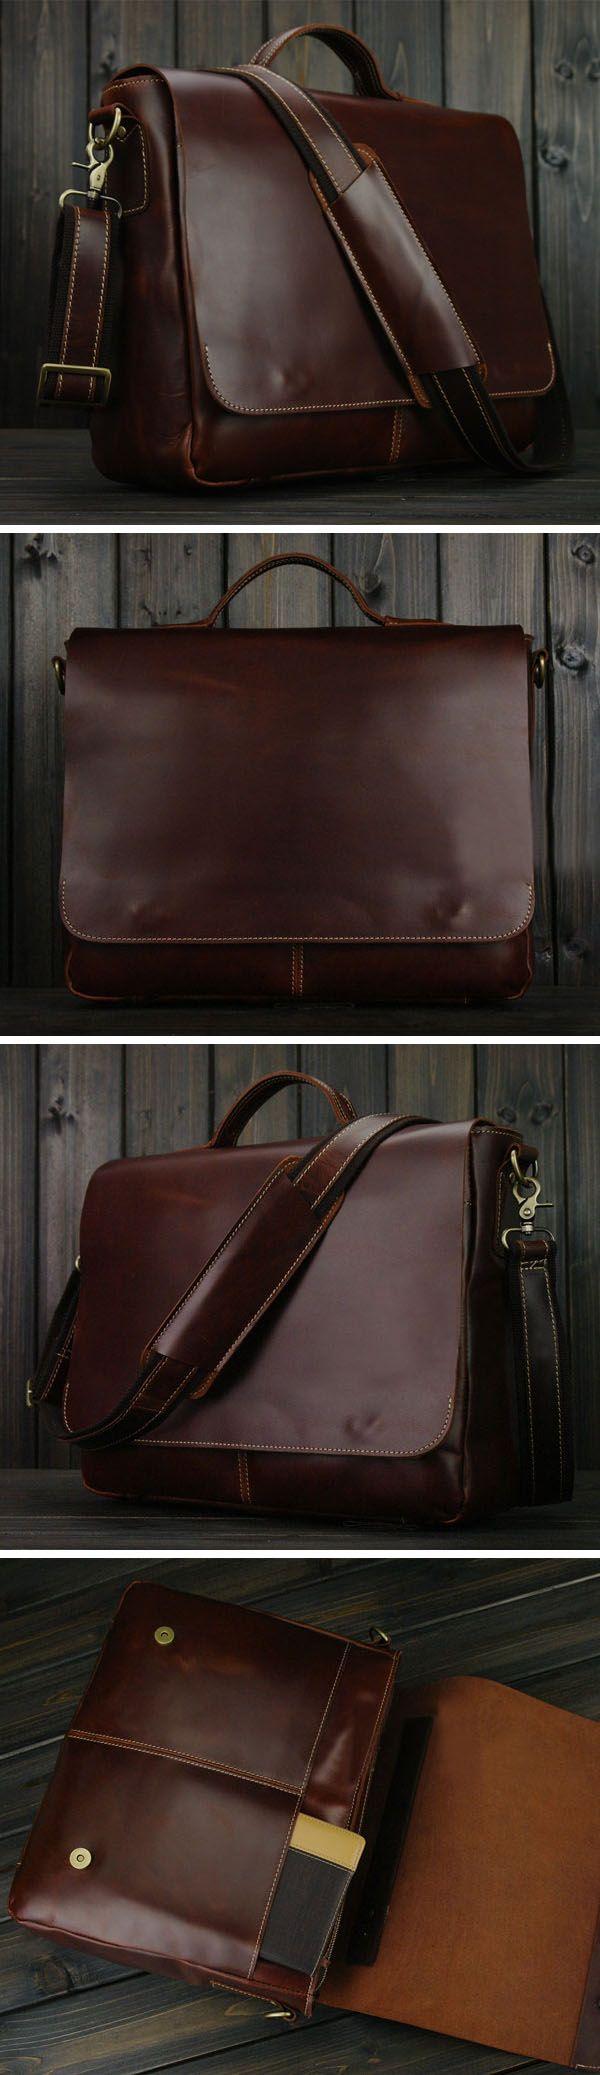 "Handmade Genuine Leather Briefcase Messenger Bag 13"" 14"" 15"" Laptop 13"" 15"" MacBook Bag red wine"